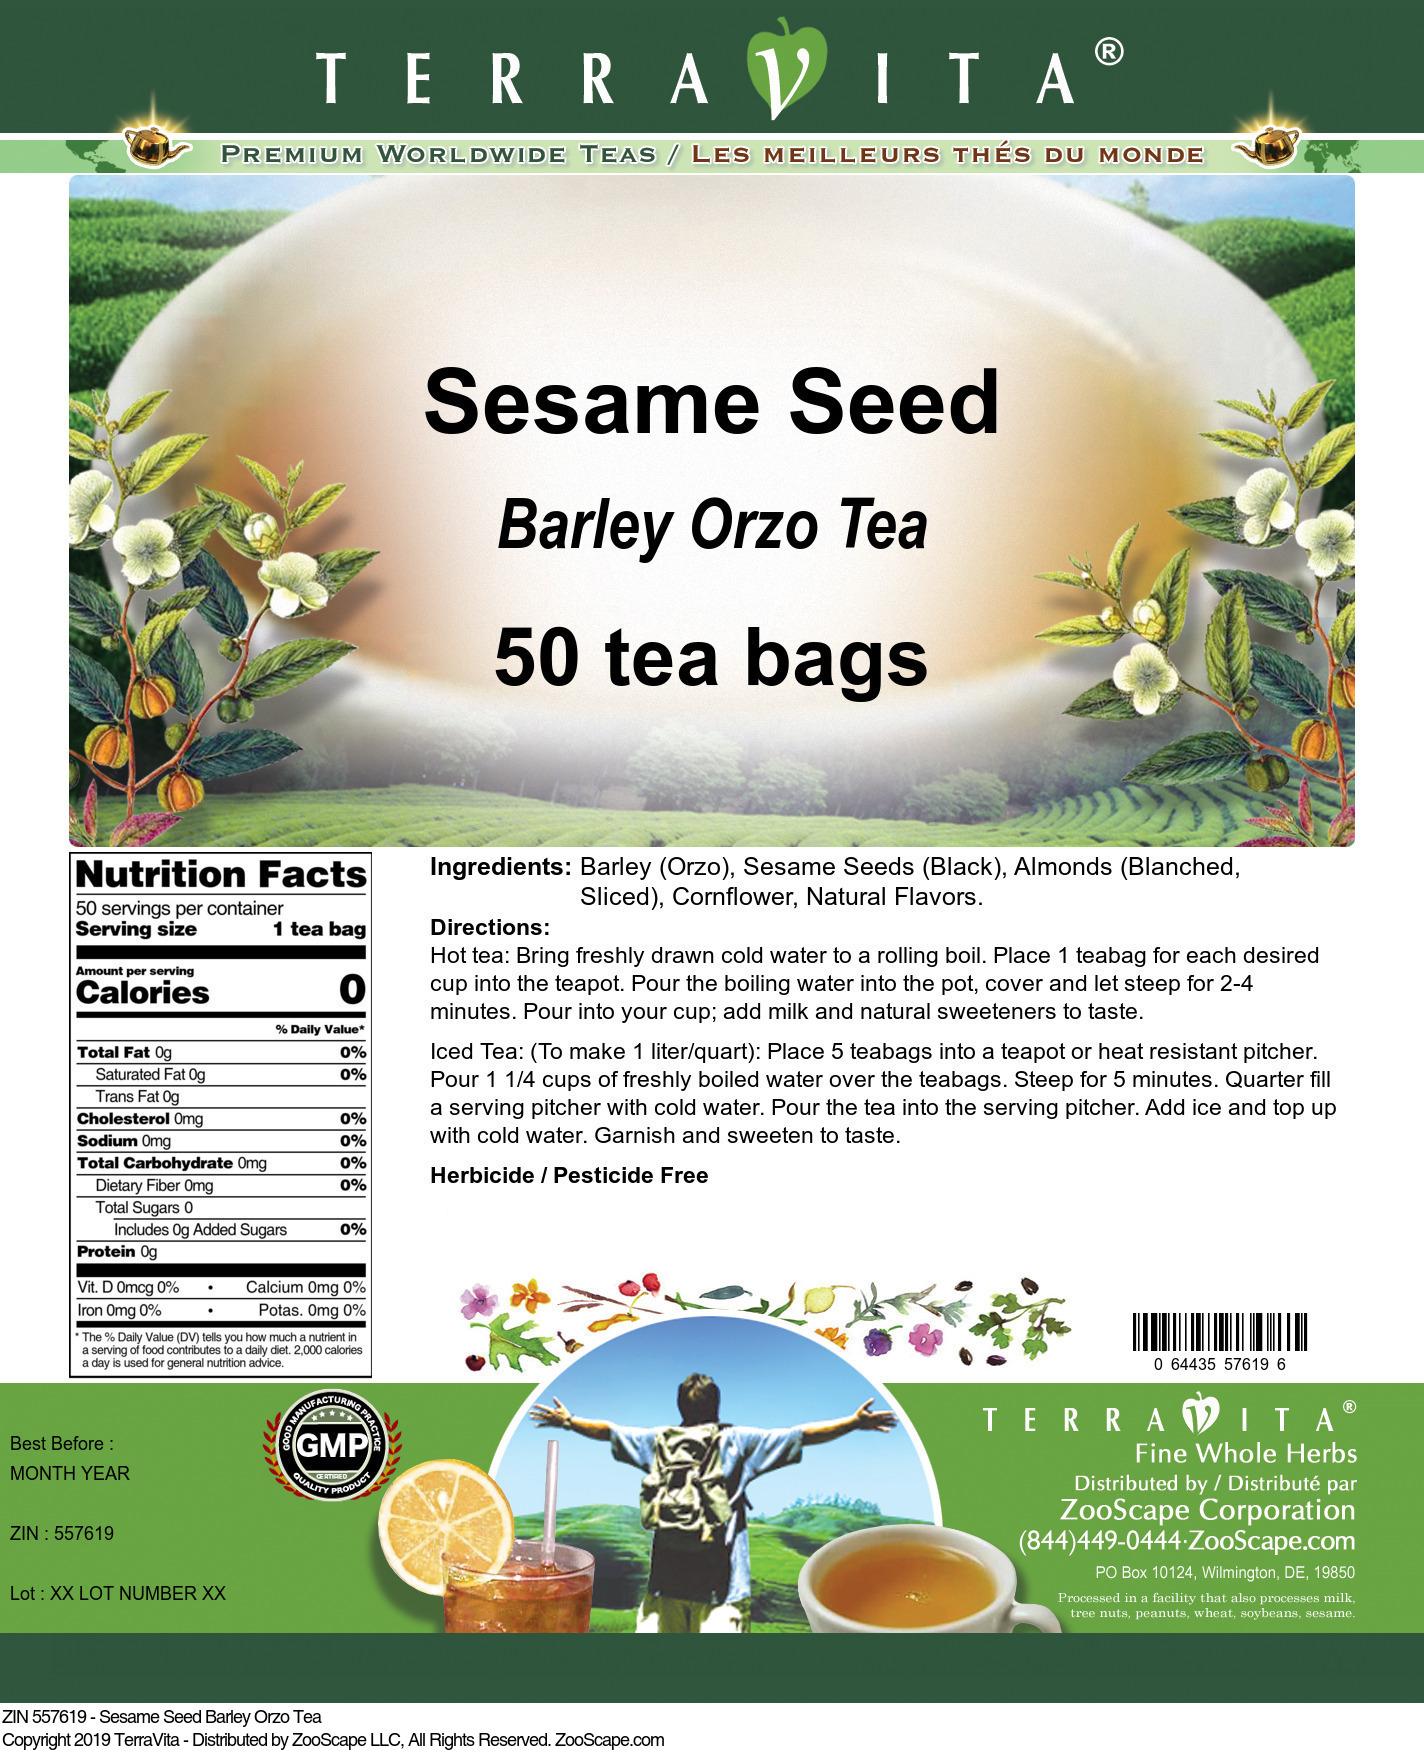 Sesame Seed Barley Orzo